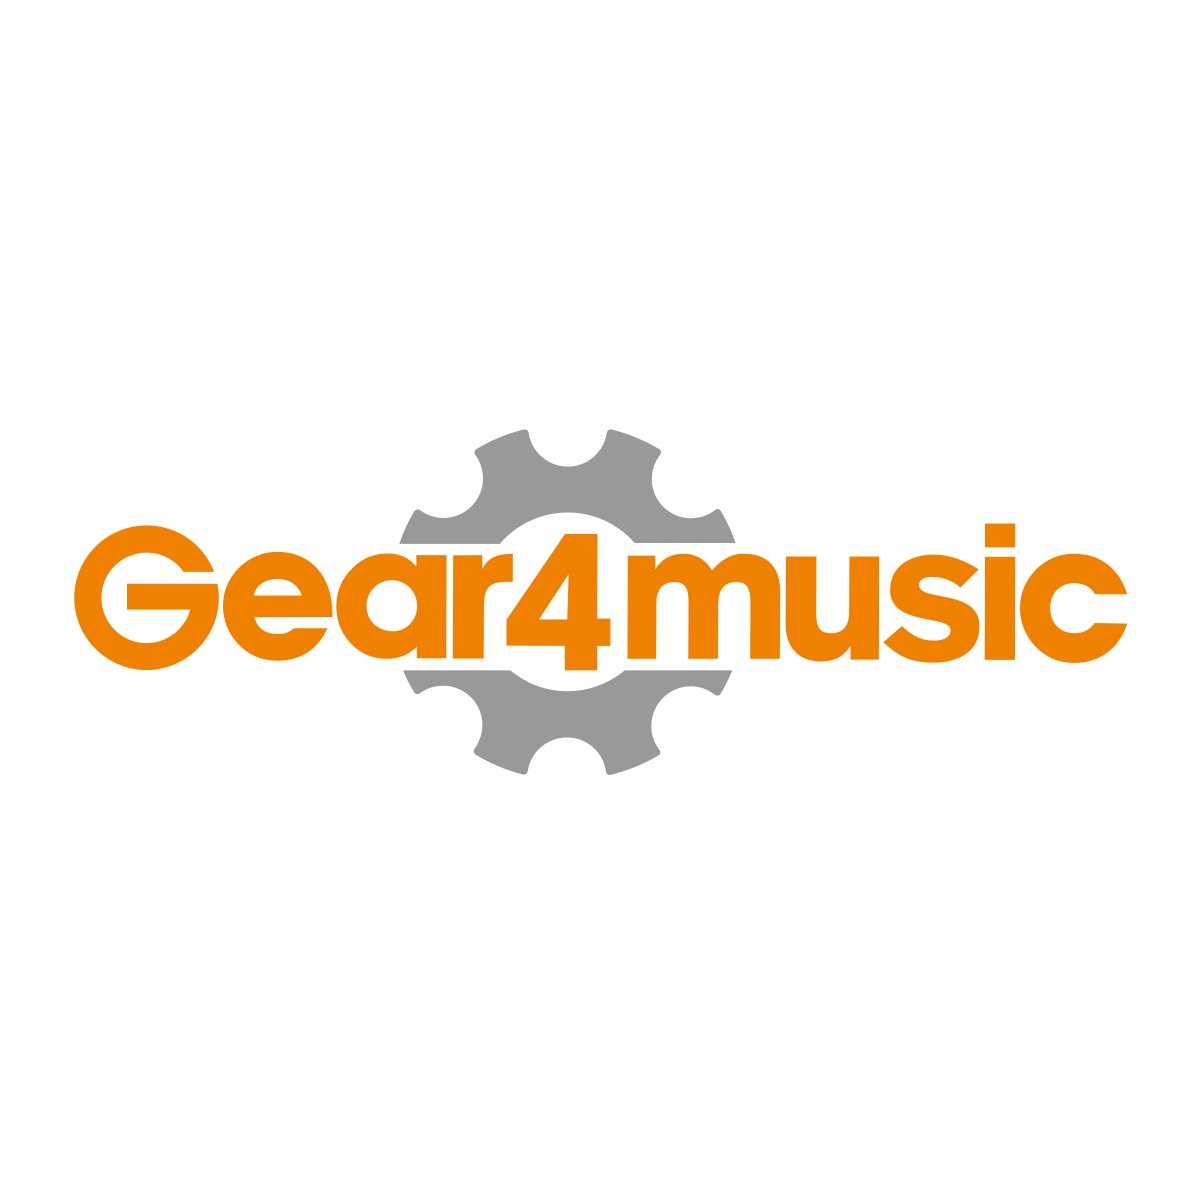 Elektro akustická baskytara do Gear4music, vlevo podal